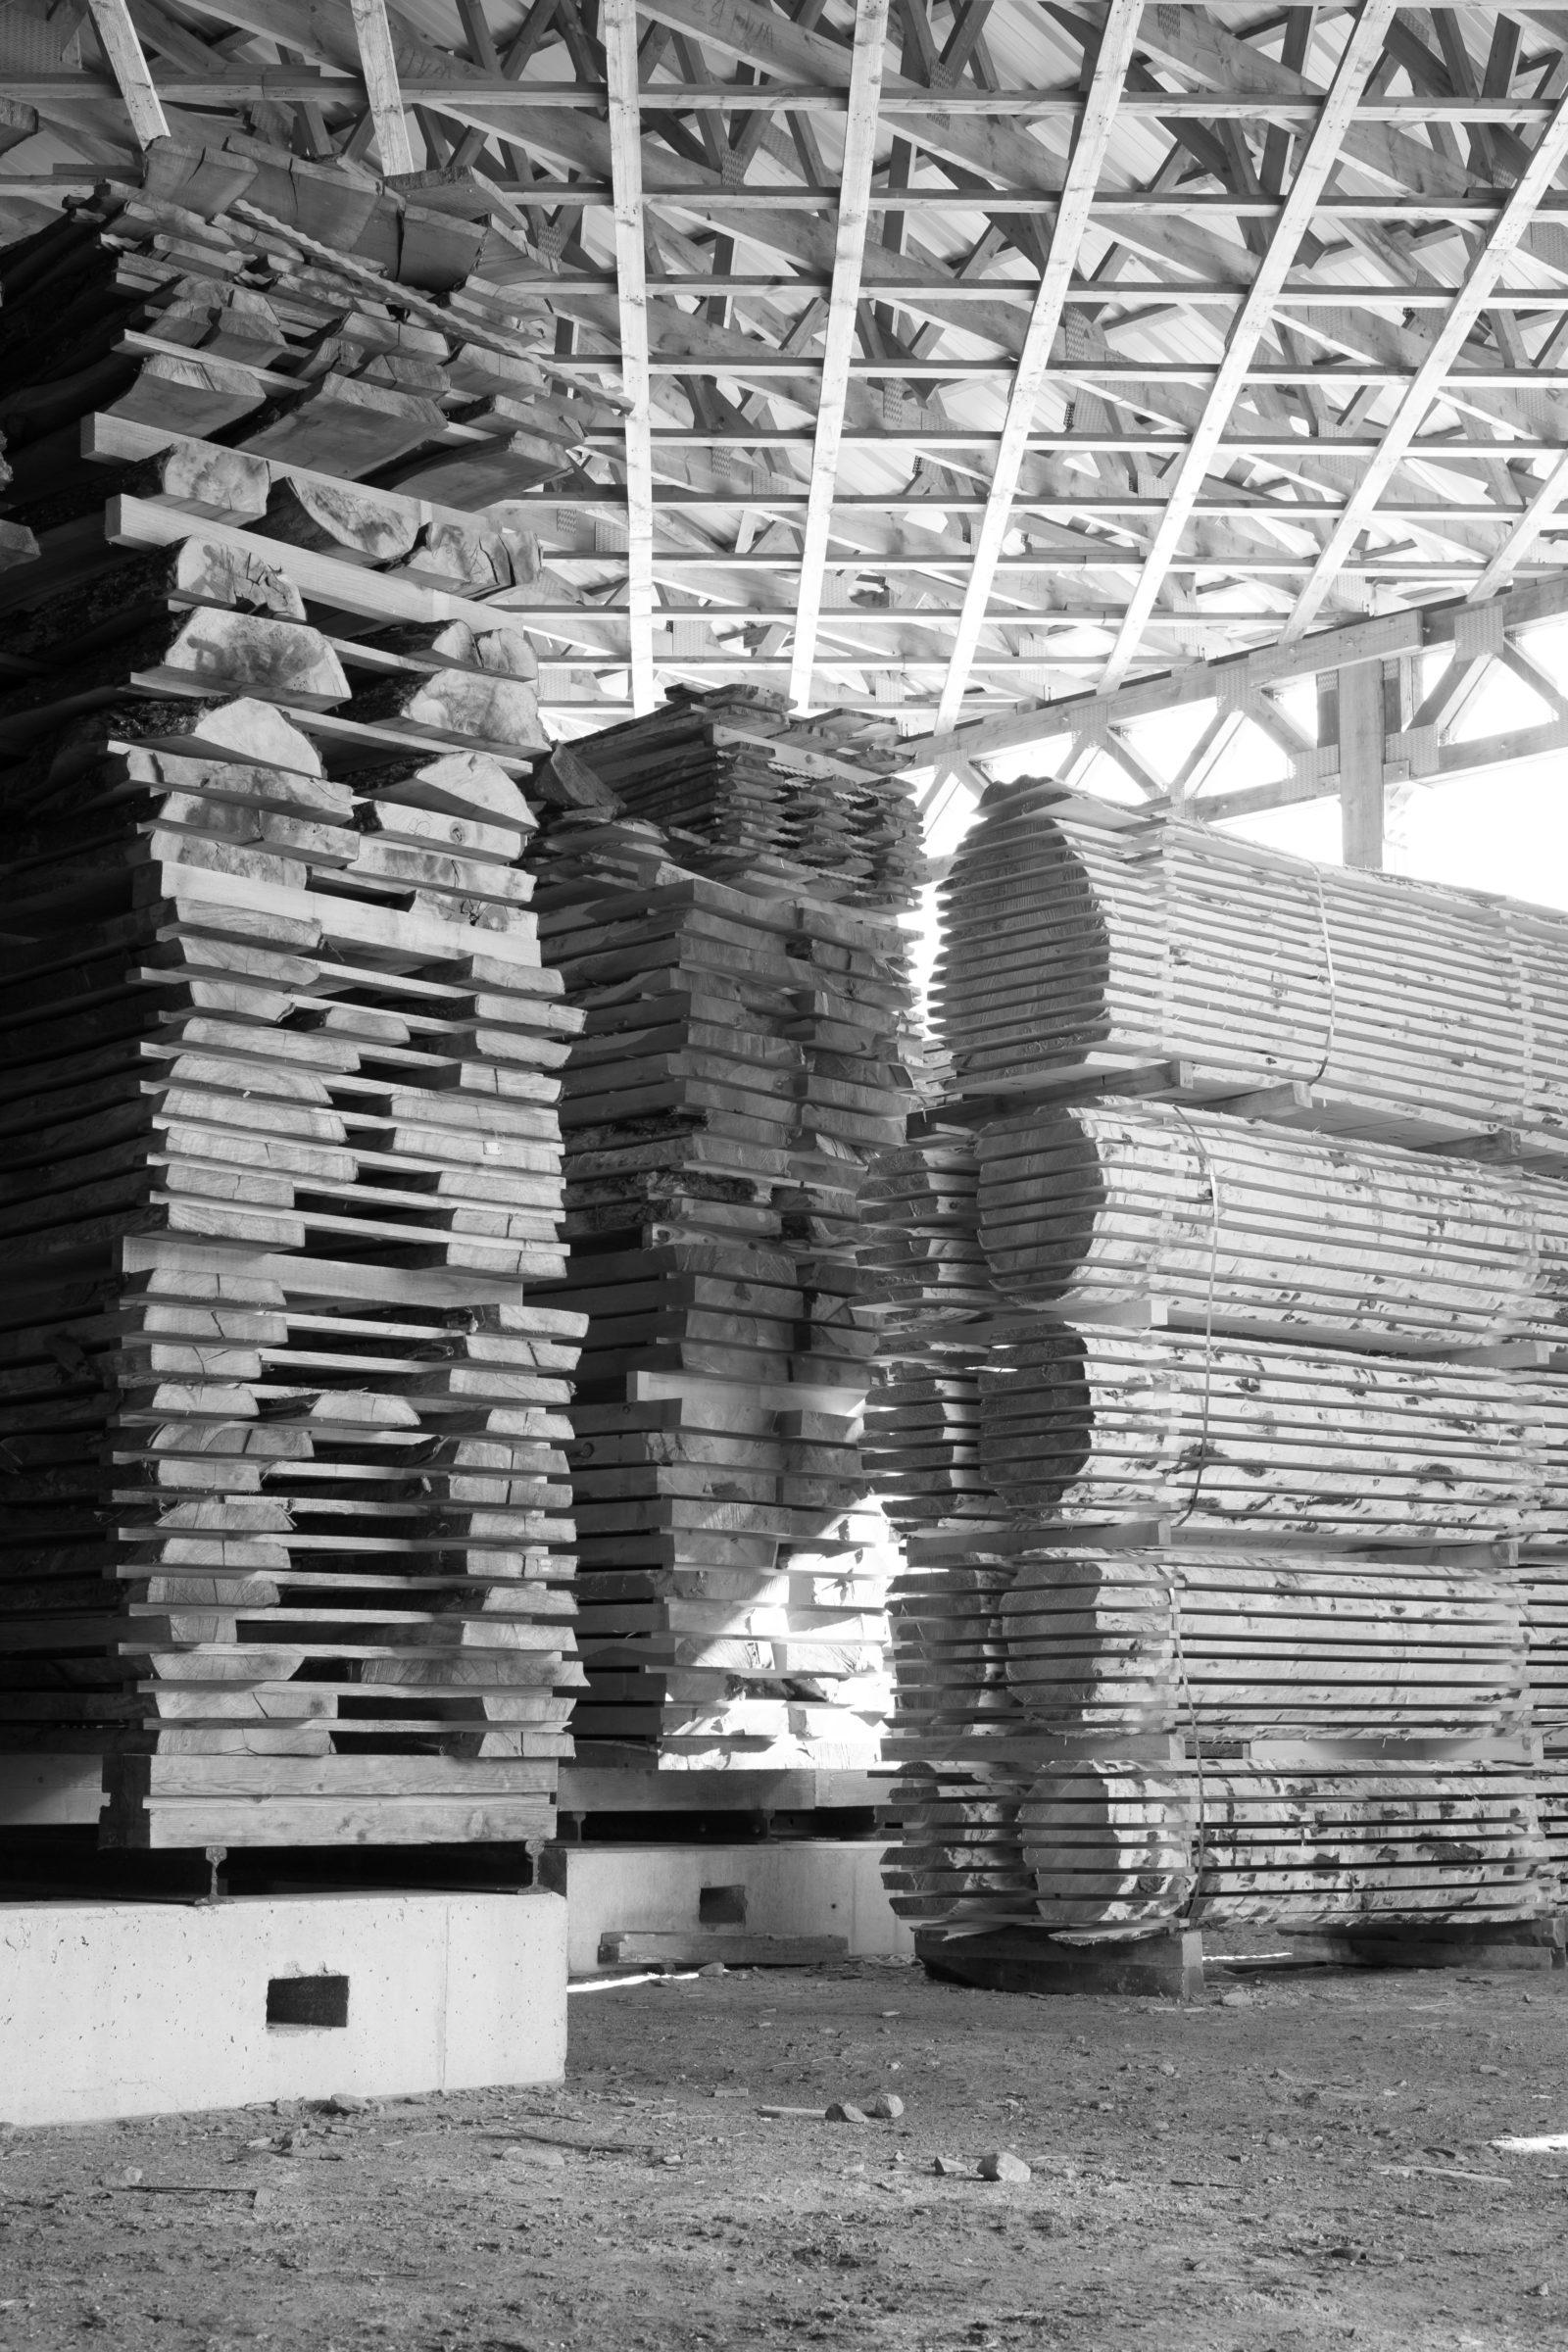 Mondholz, Holz, Schnittholz, Tischlerei, Thoma, The Trees of Life